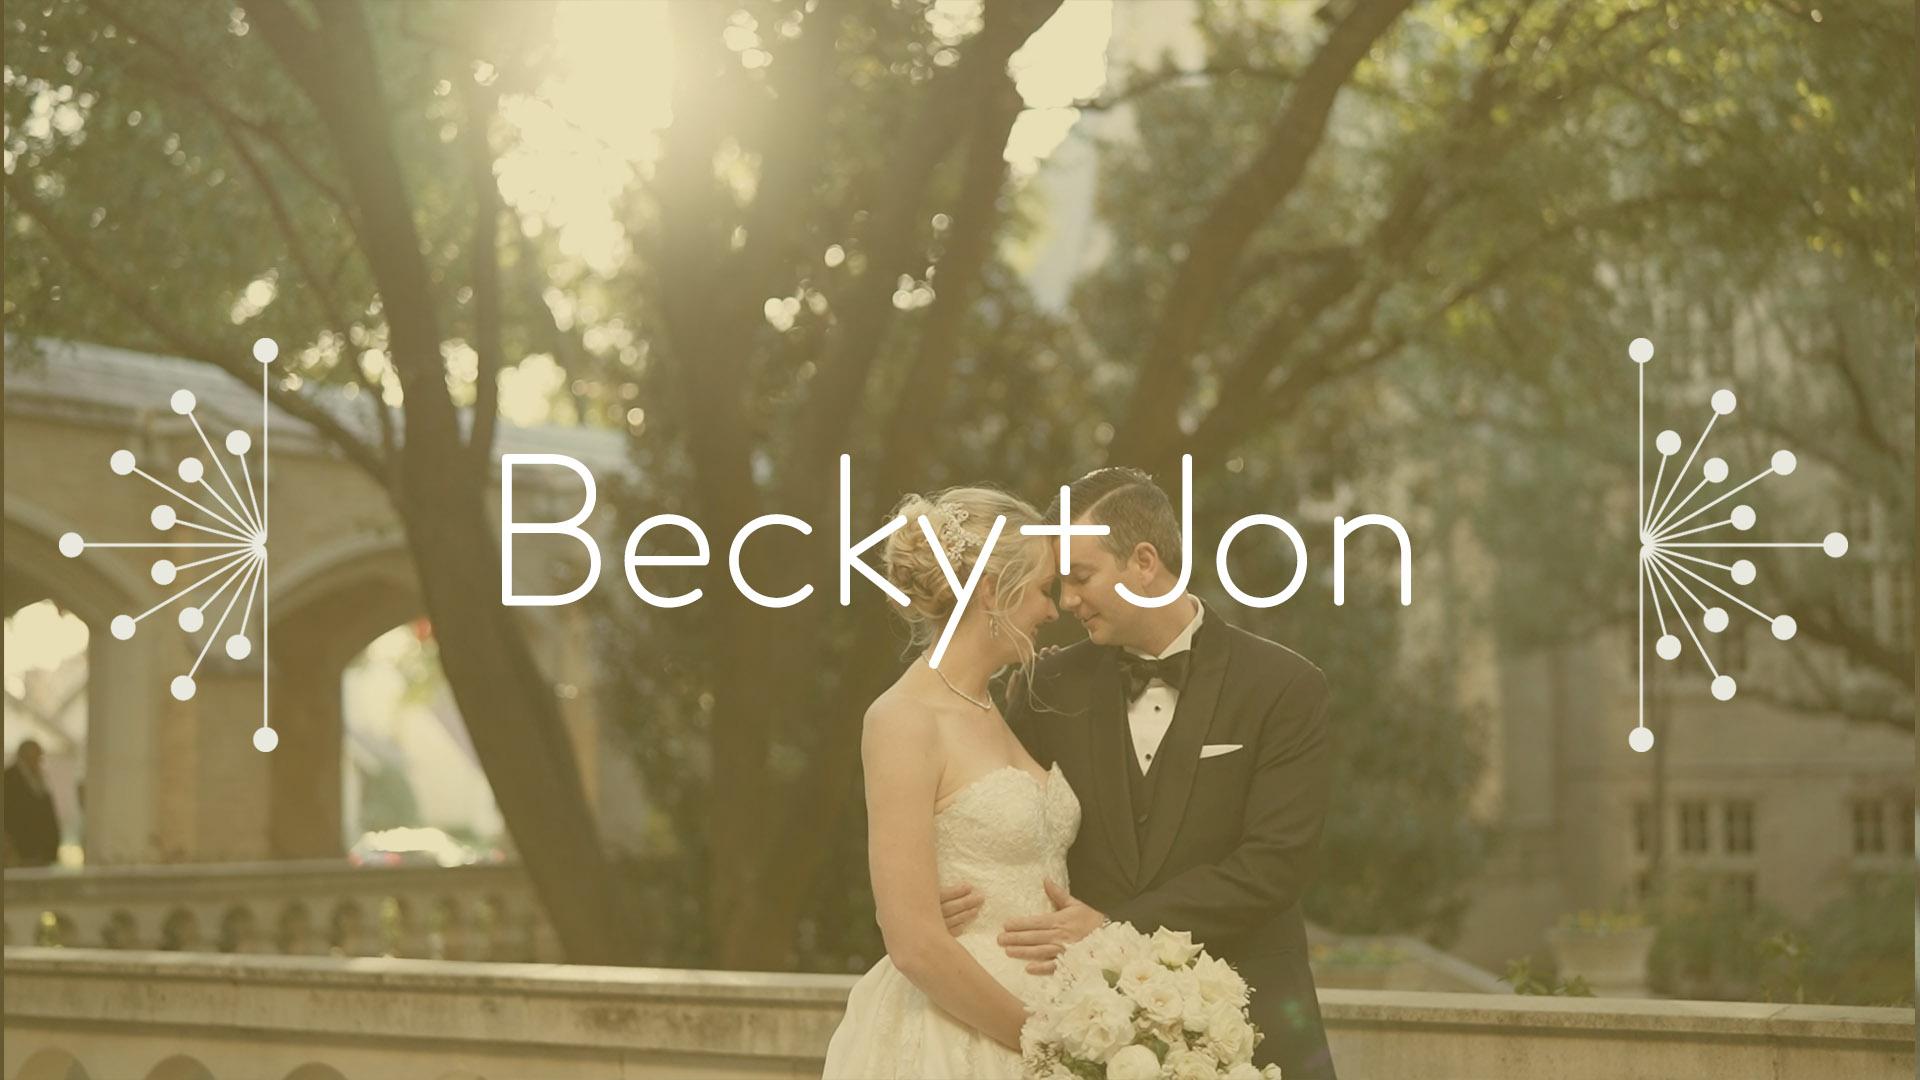 Becky + Jon | Dallas, Texas | Union Station Dallas